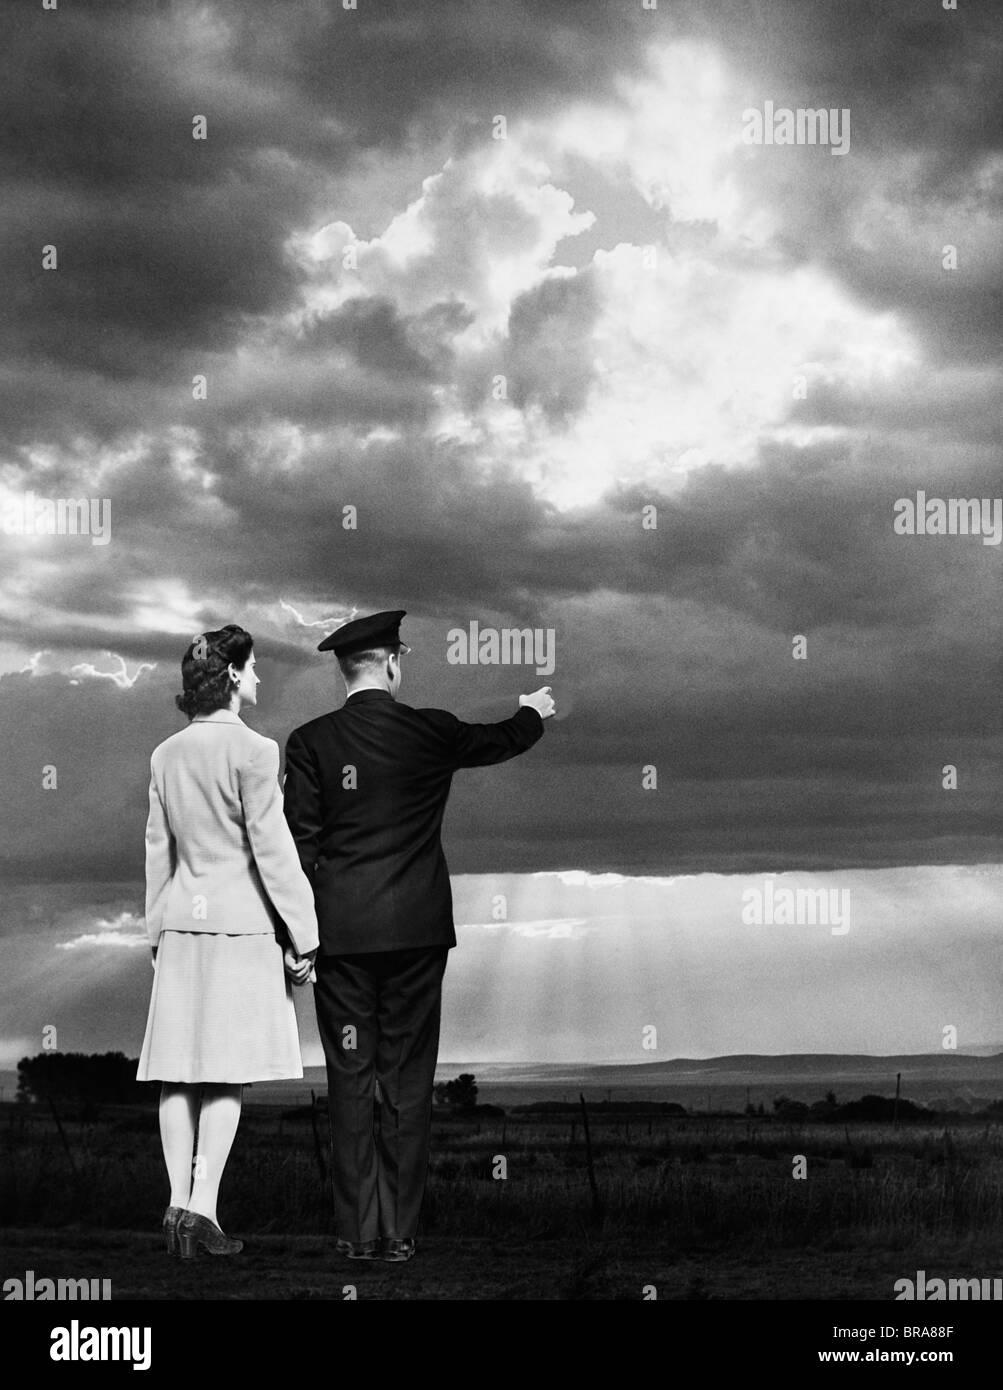 SUNSET hombre vestido MANOS a uniforme 1940 con PAREJA militar MUJER apuntando HOMBRE wq6nTpBg